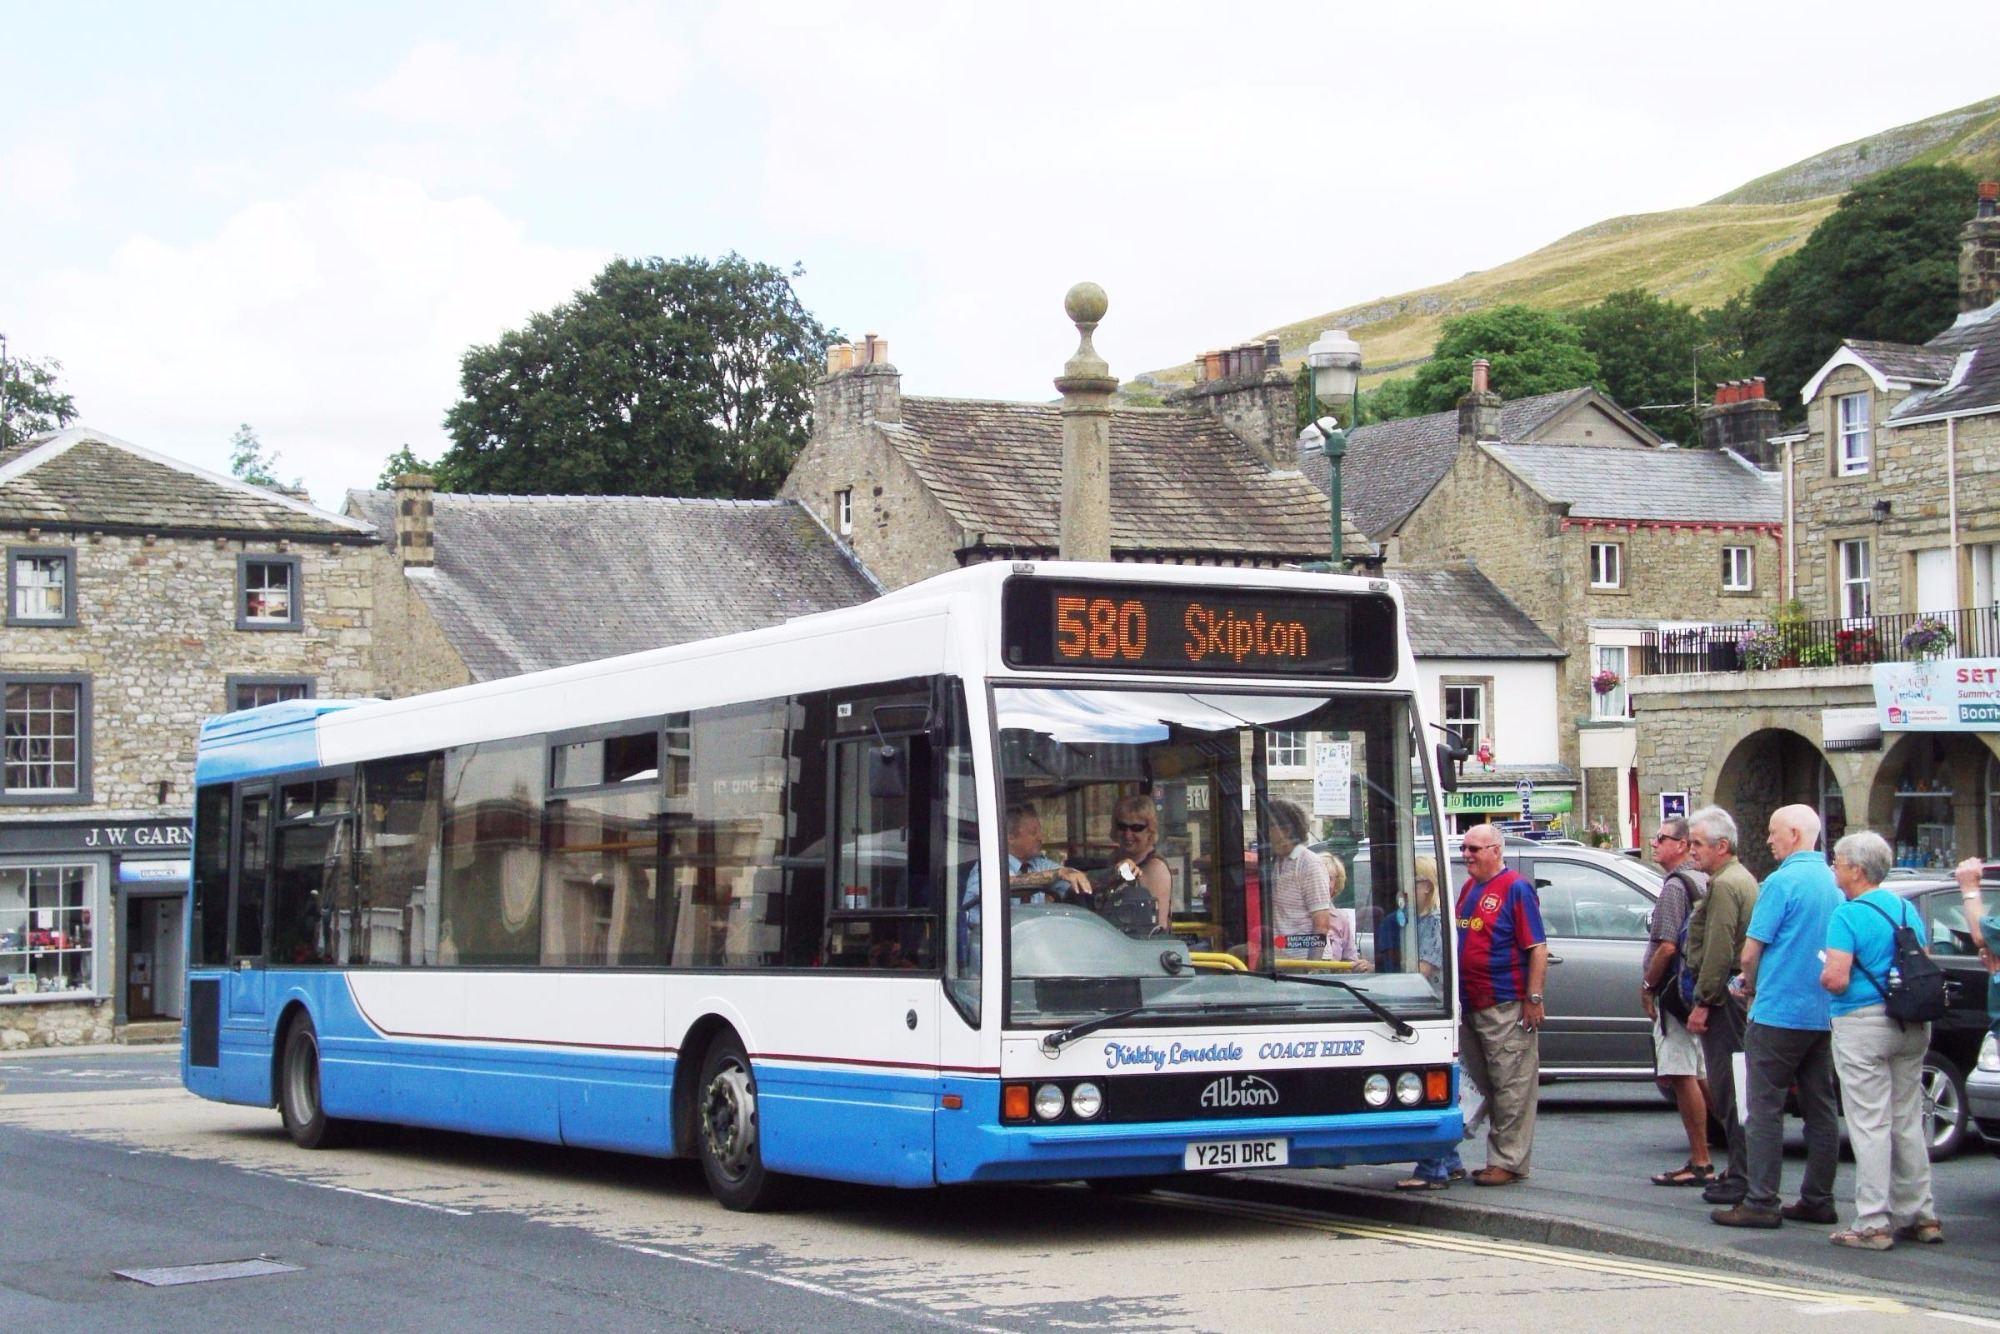 581 Bus Service